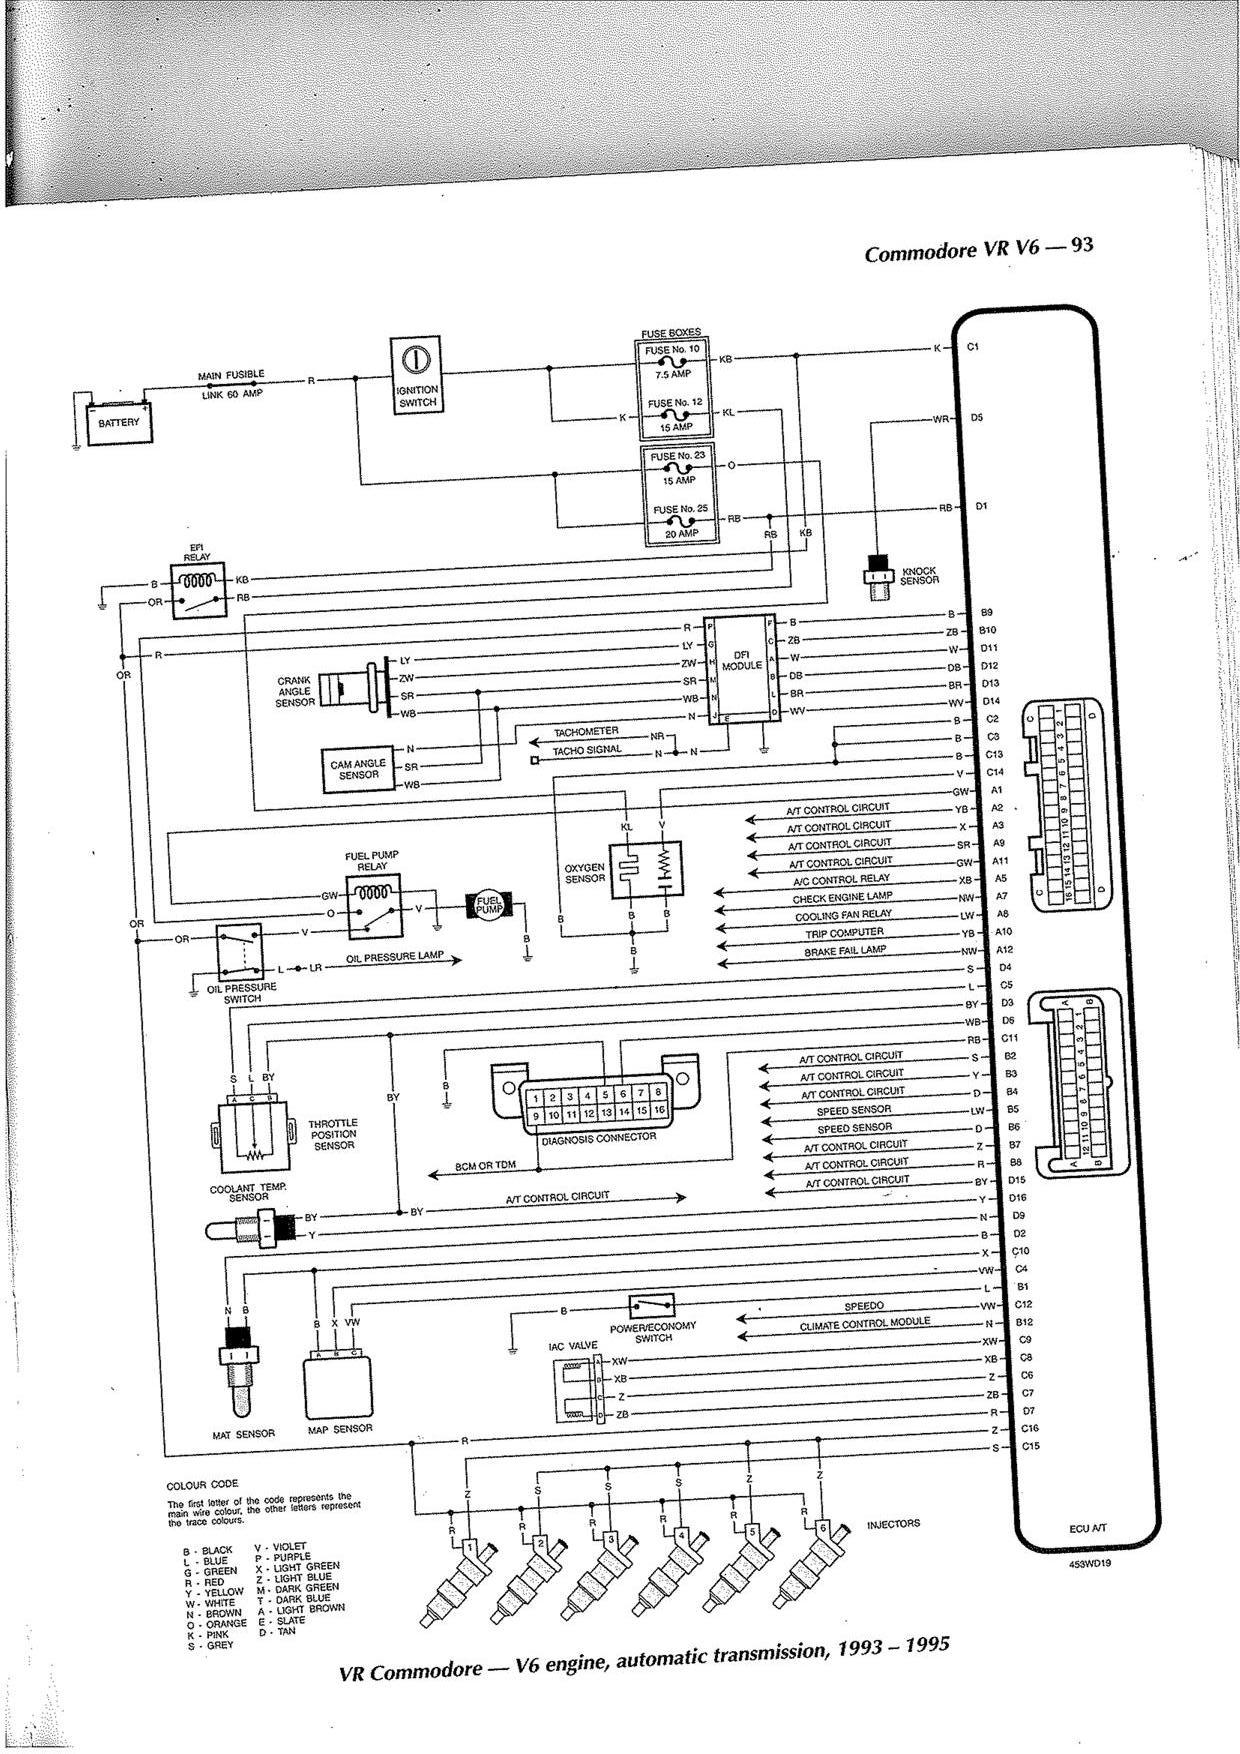 1992 3800 V6 Engine Diagram Piping Layout Engine Schematic Begeboy Wiring Diagram Source